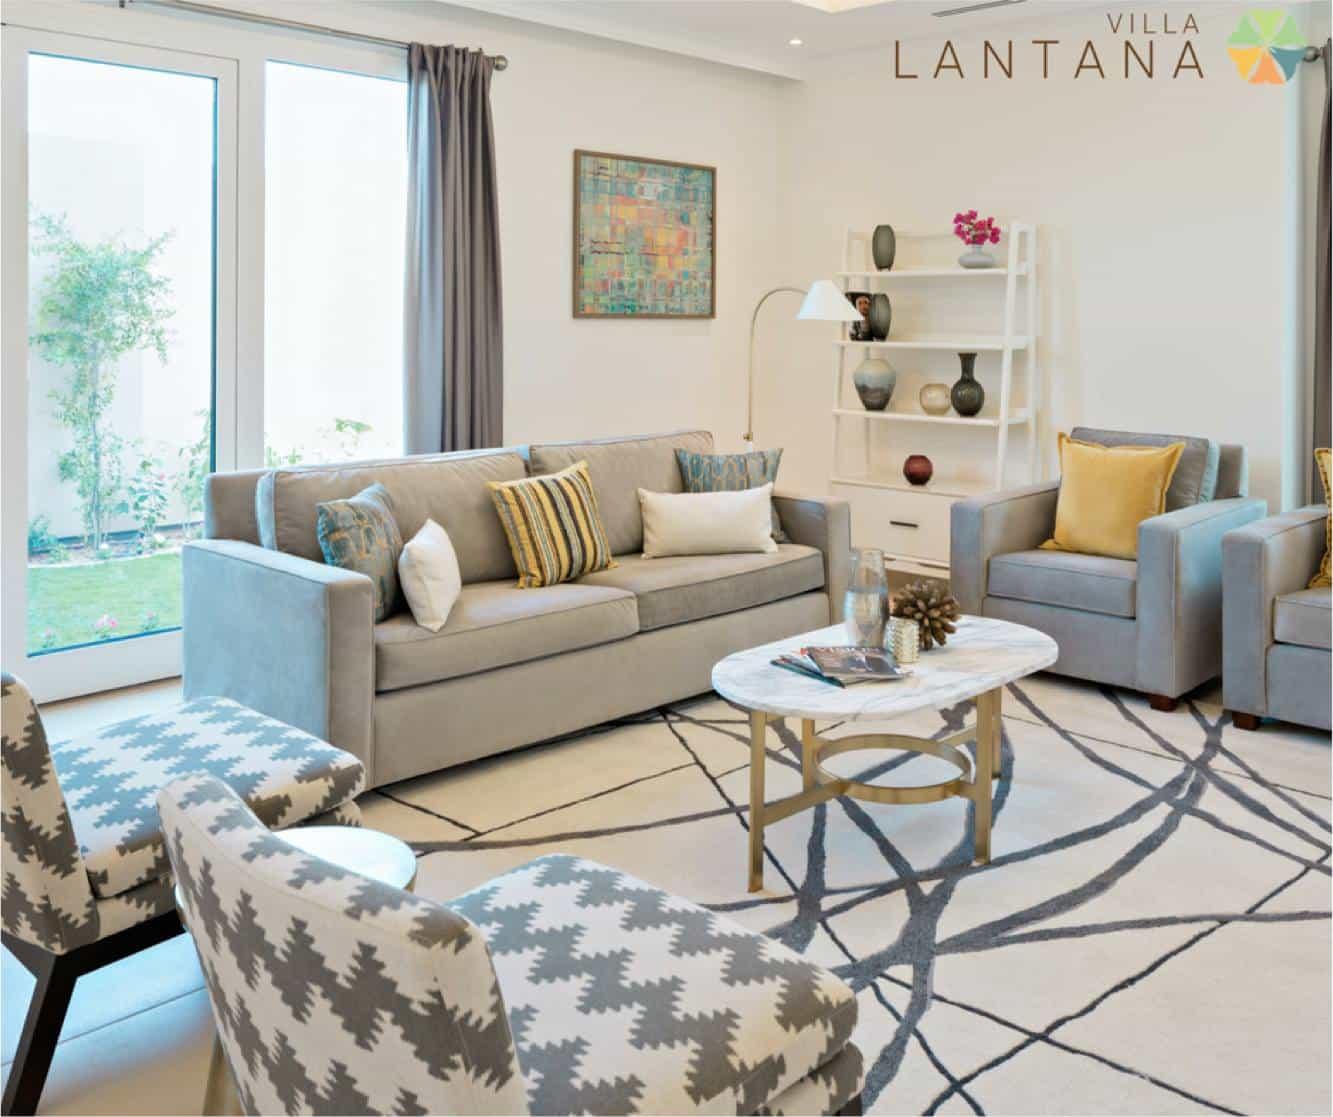 Villa Lantana by TECOM Group in Al Barsha. Luxury apartments for Sale in Dubai